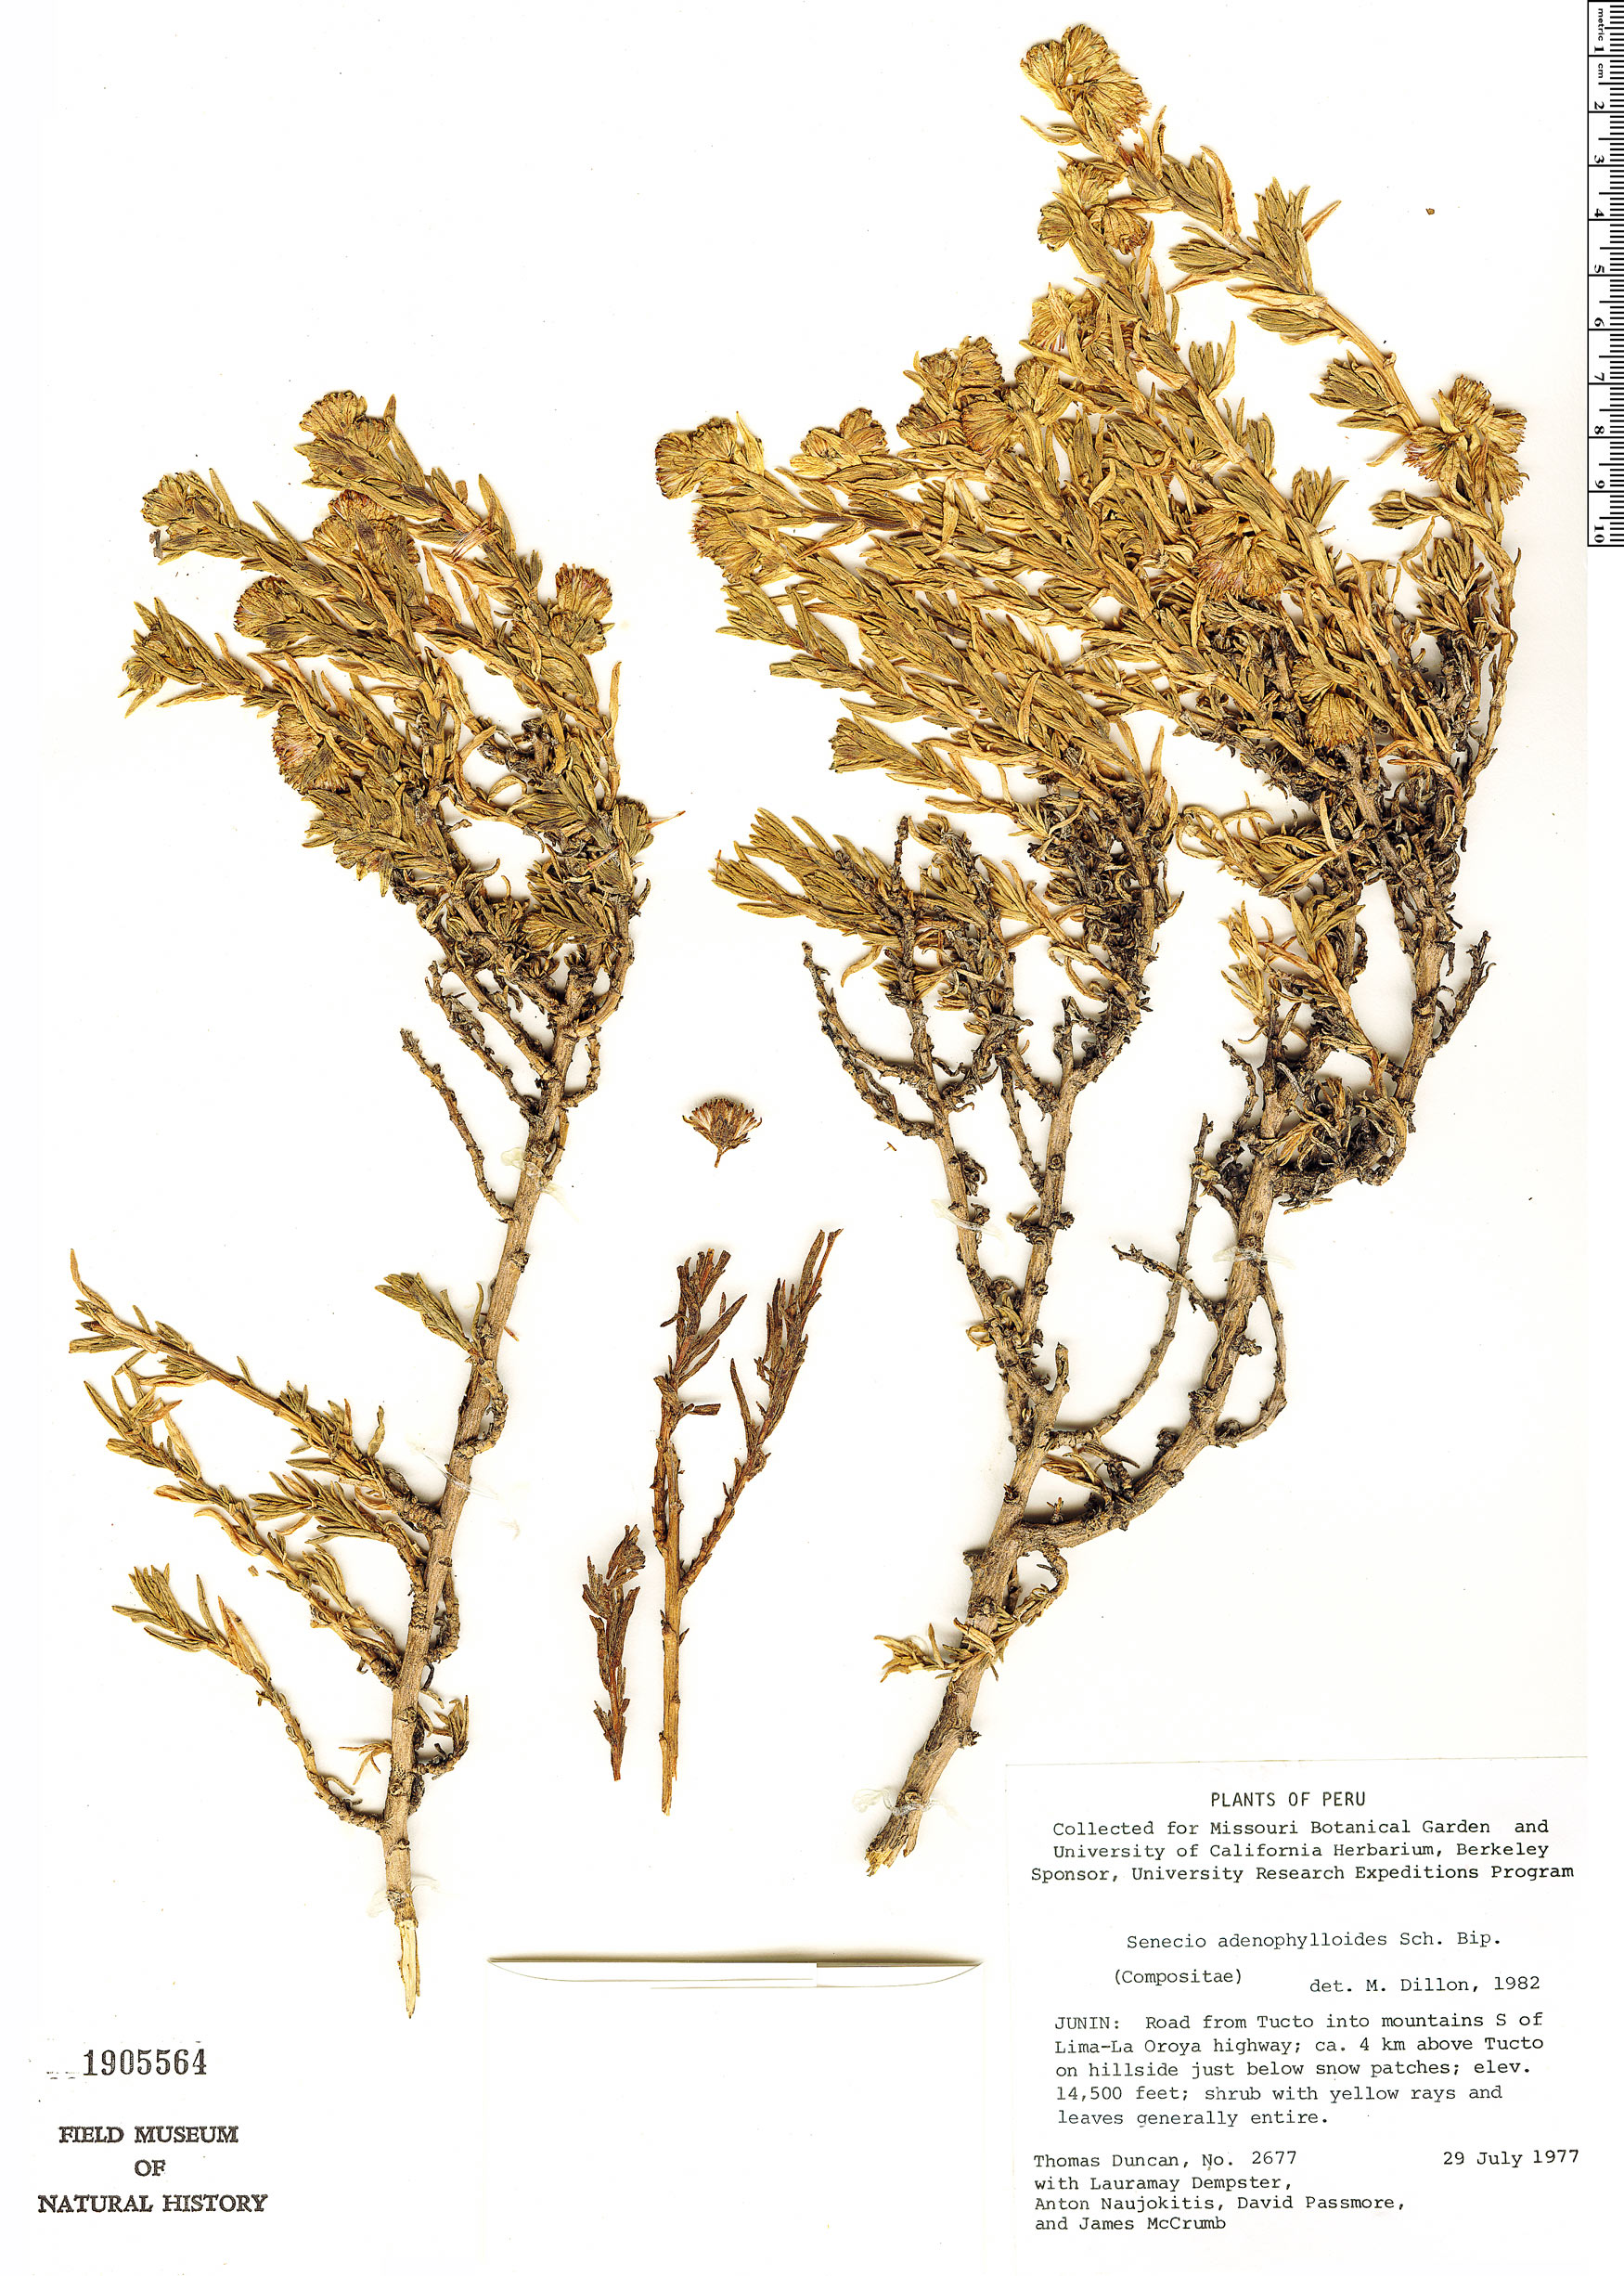 Espécime: Senecio adenophylloides